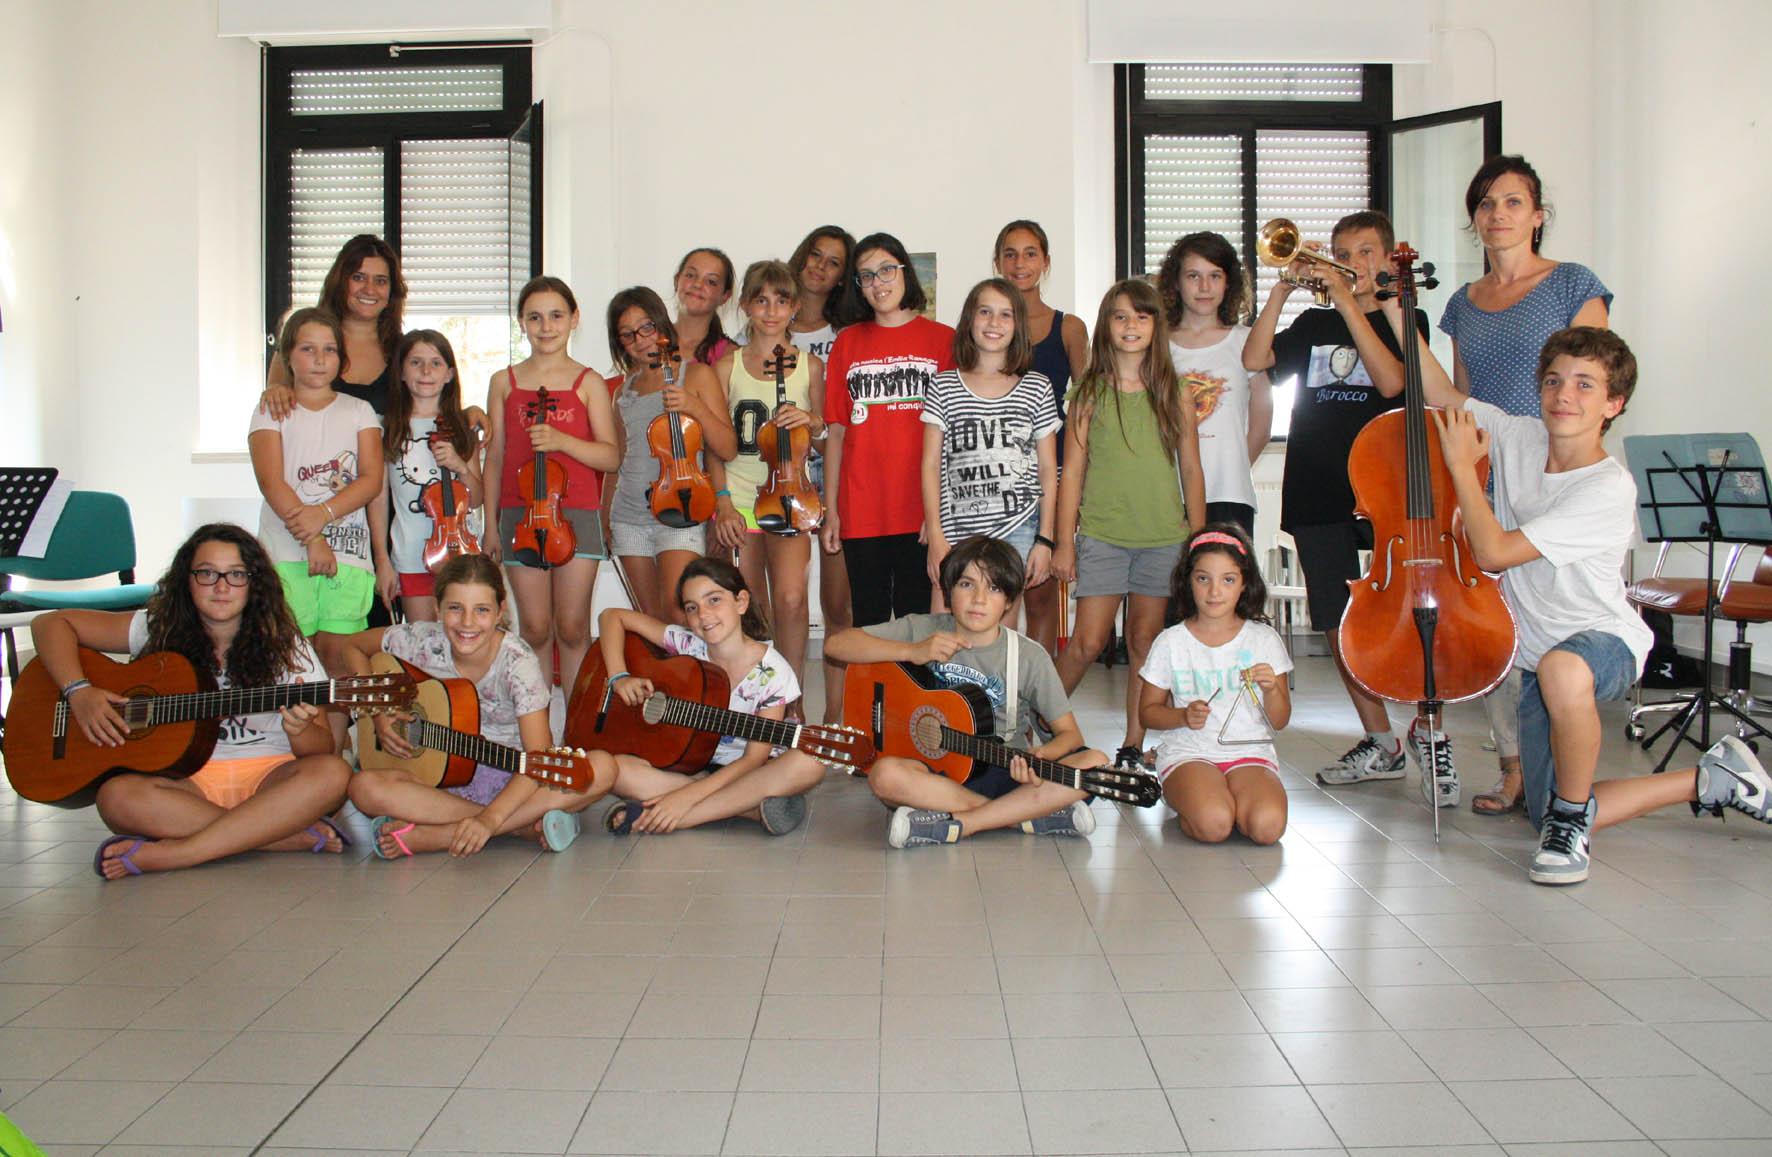 Accademia Bizantina, il Summer camp fra musica, teatro e arte